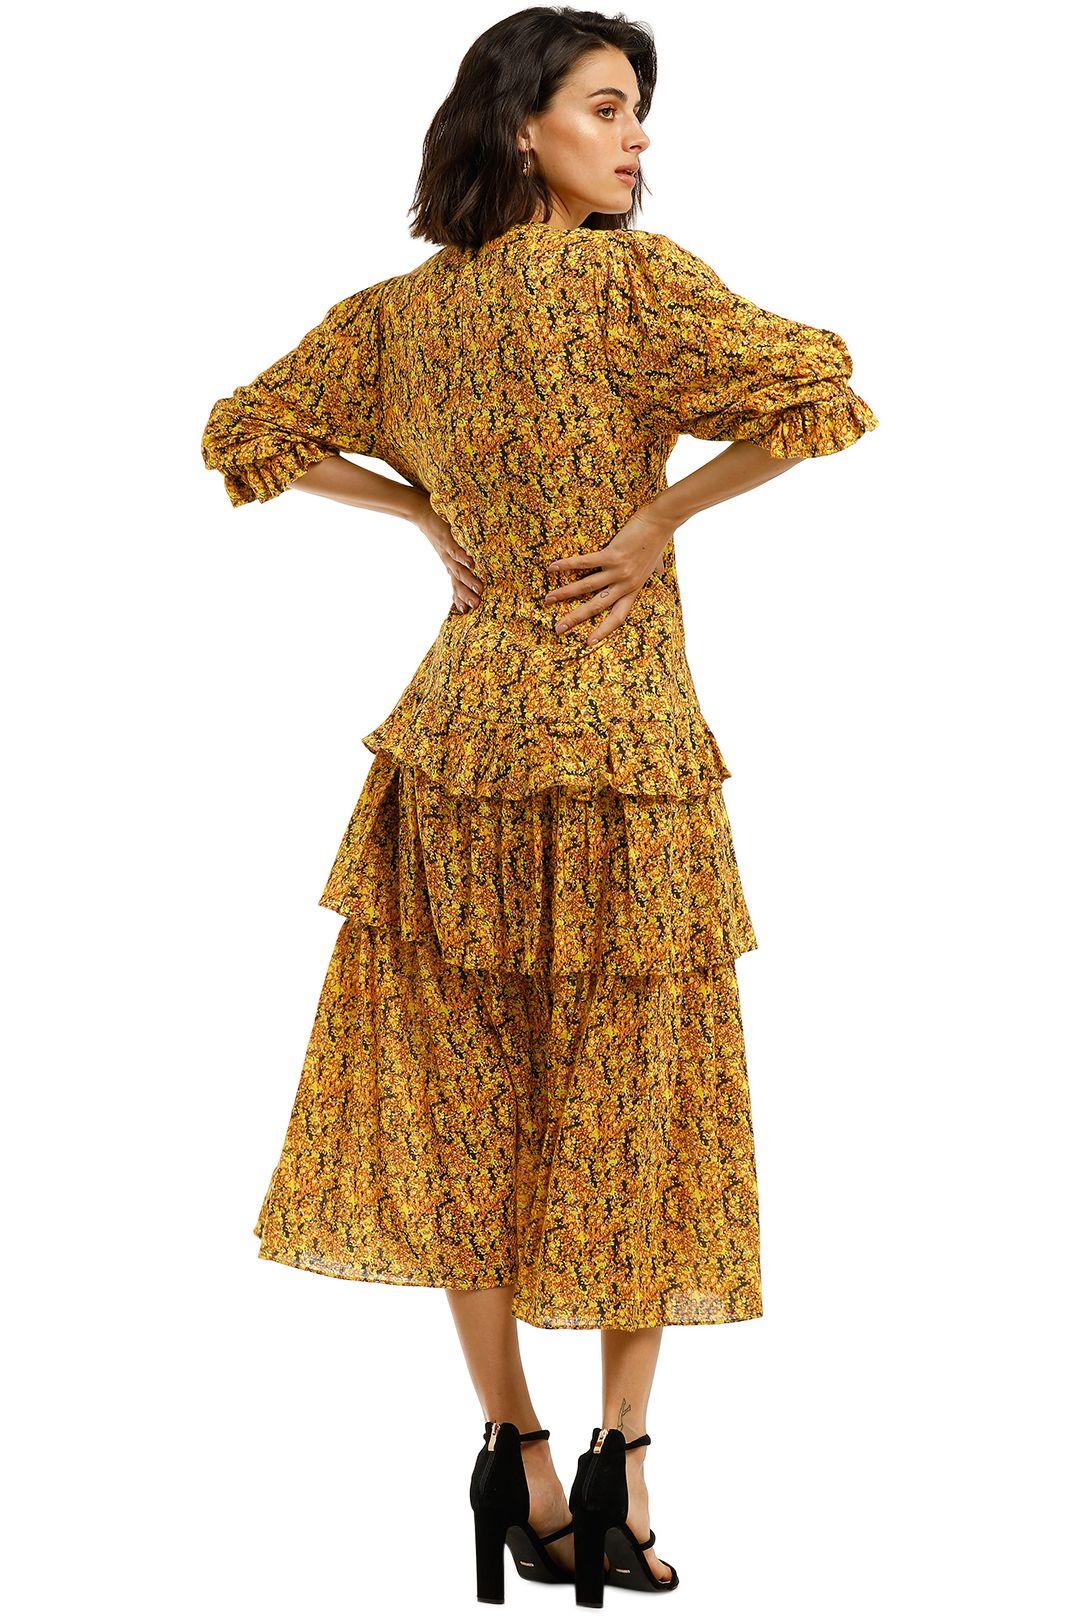 C&M-Camilla-And-Marc-Rimini-Tiered-Dress-Asterid-Print-Back